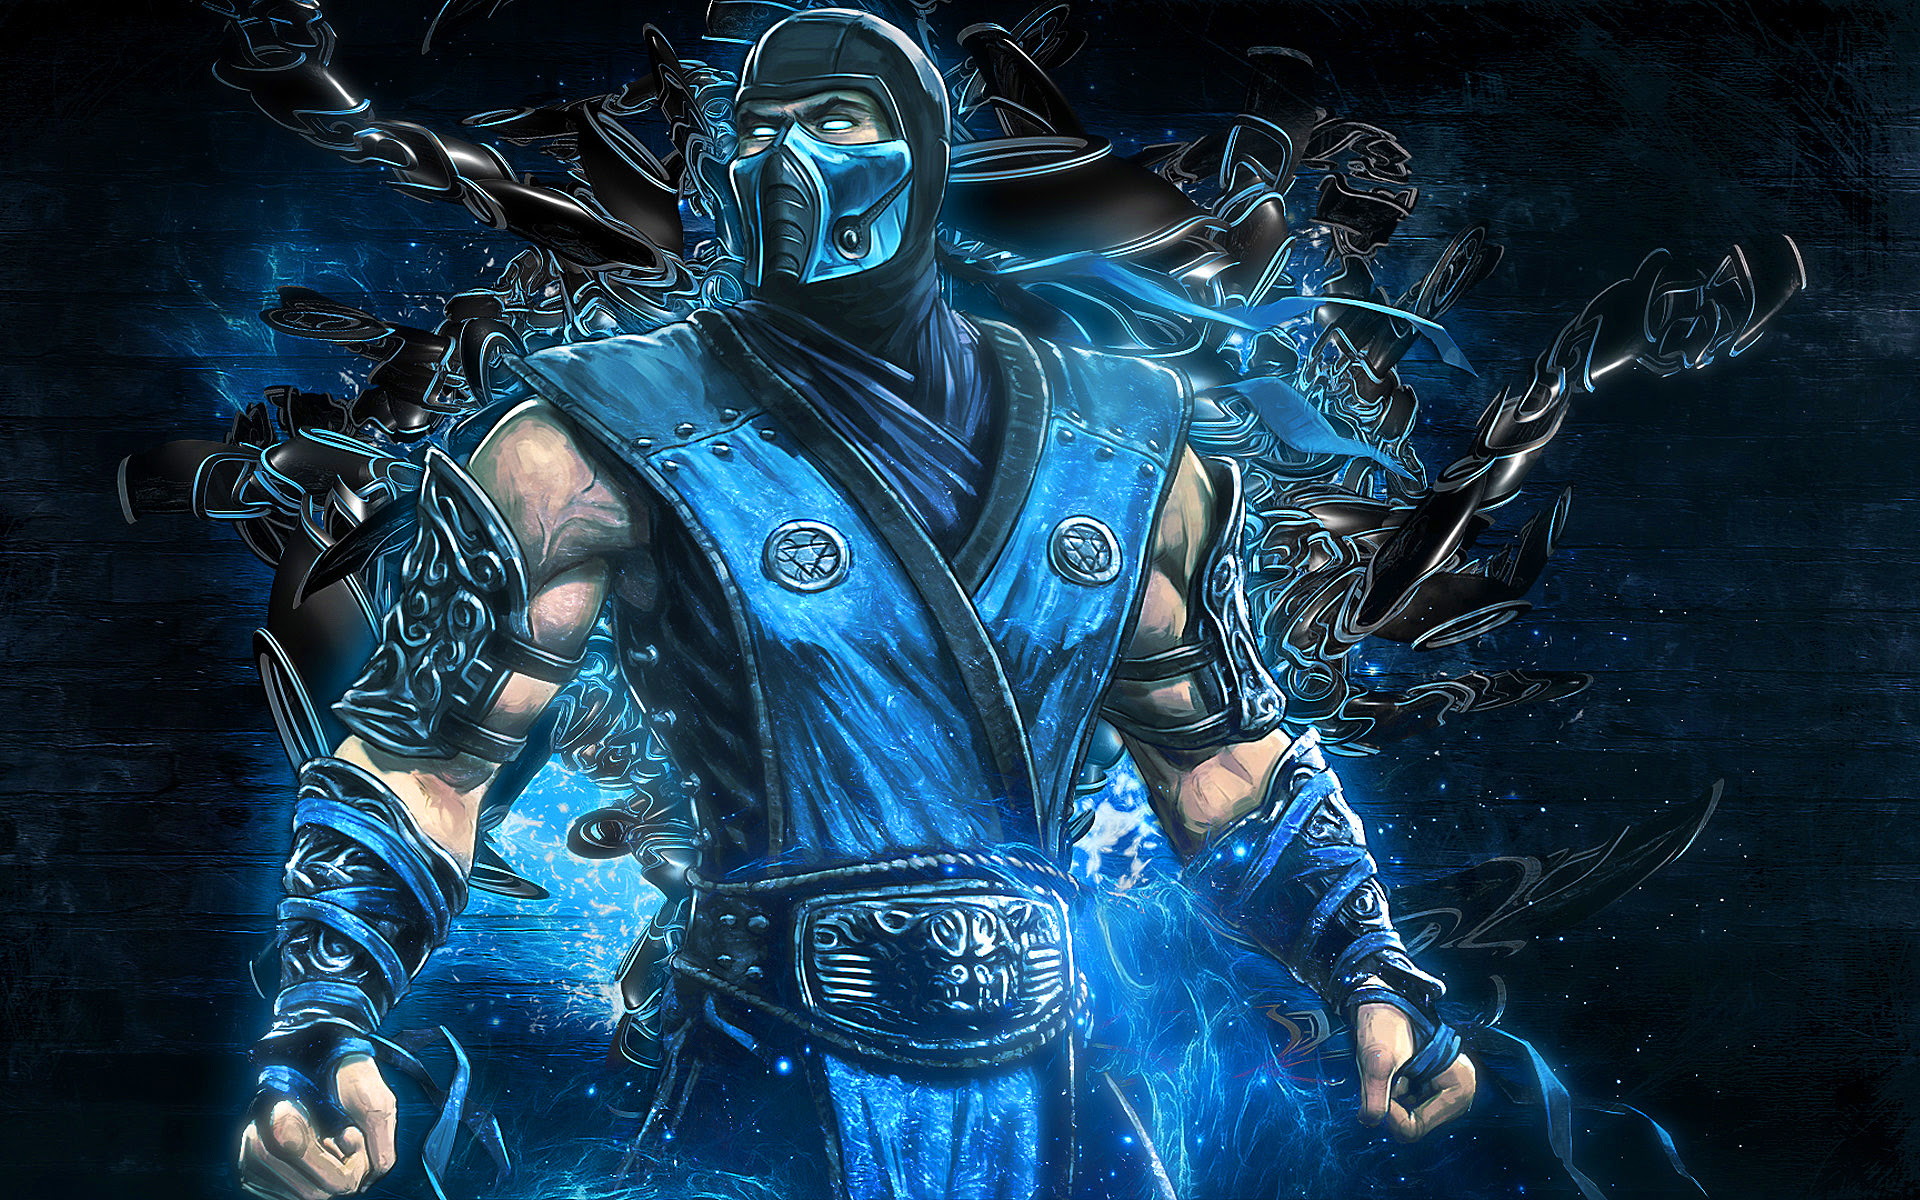 Mortal Combat Hd Desktop Wallpapers 4k Hd